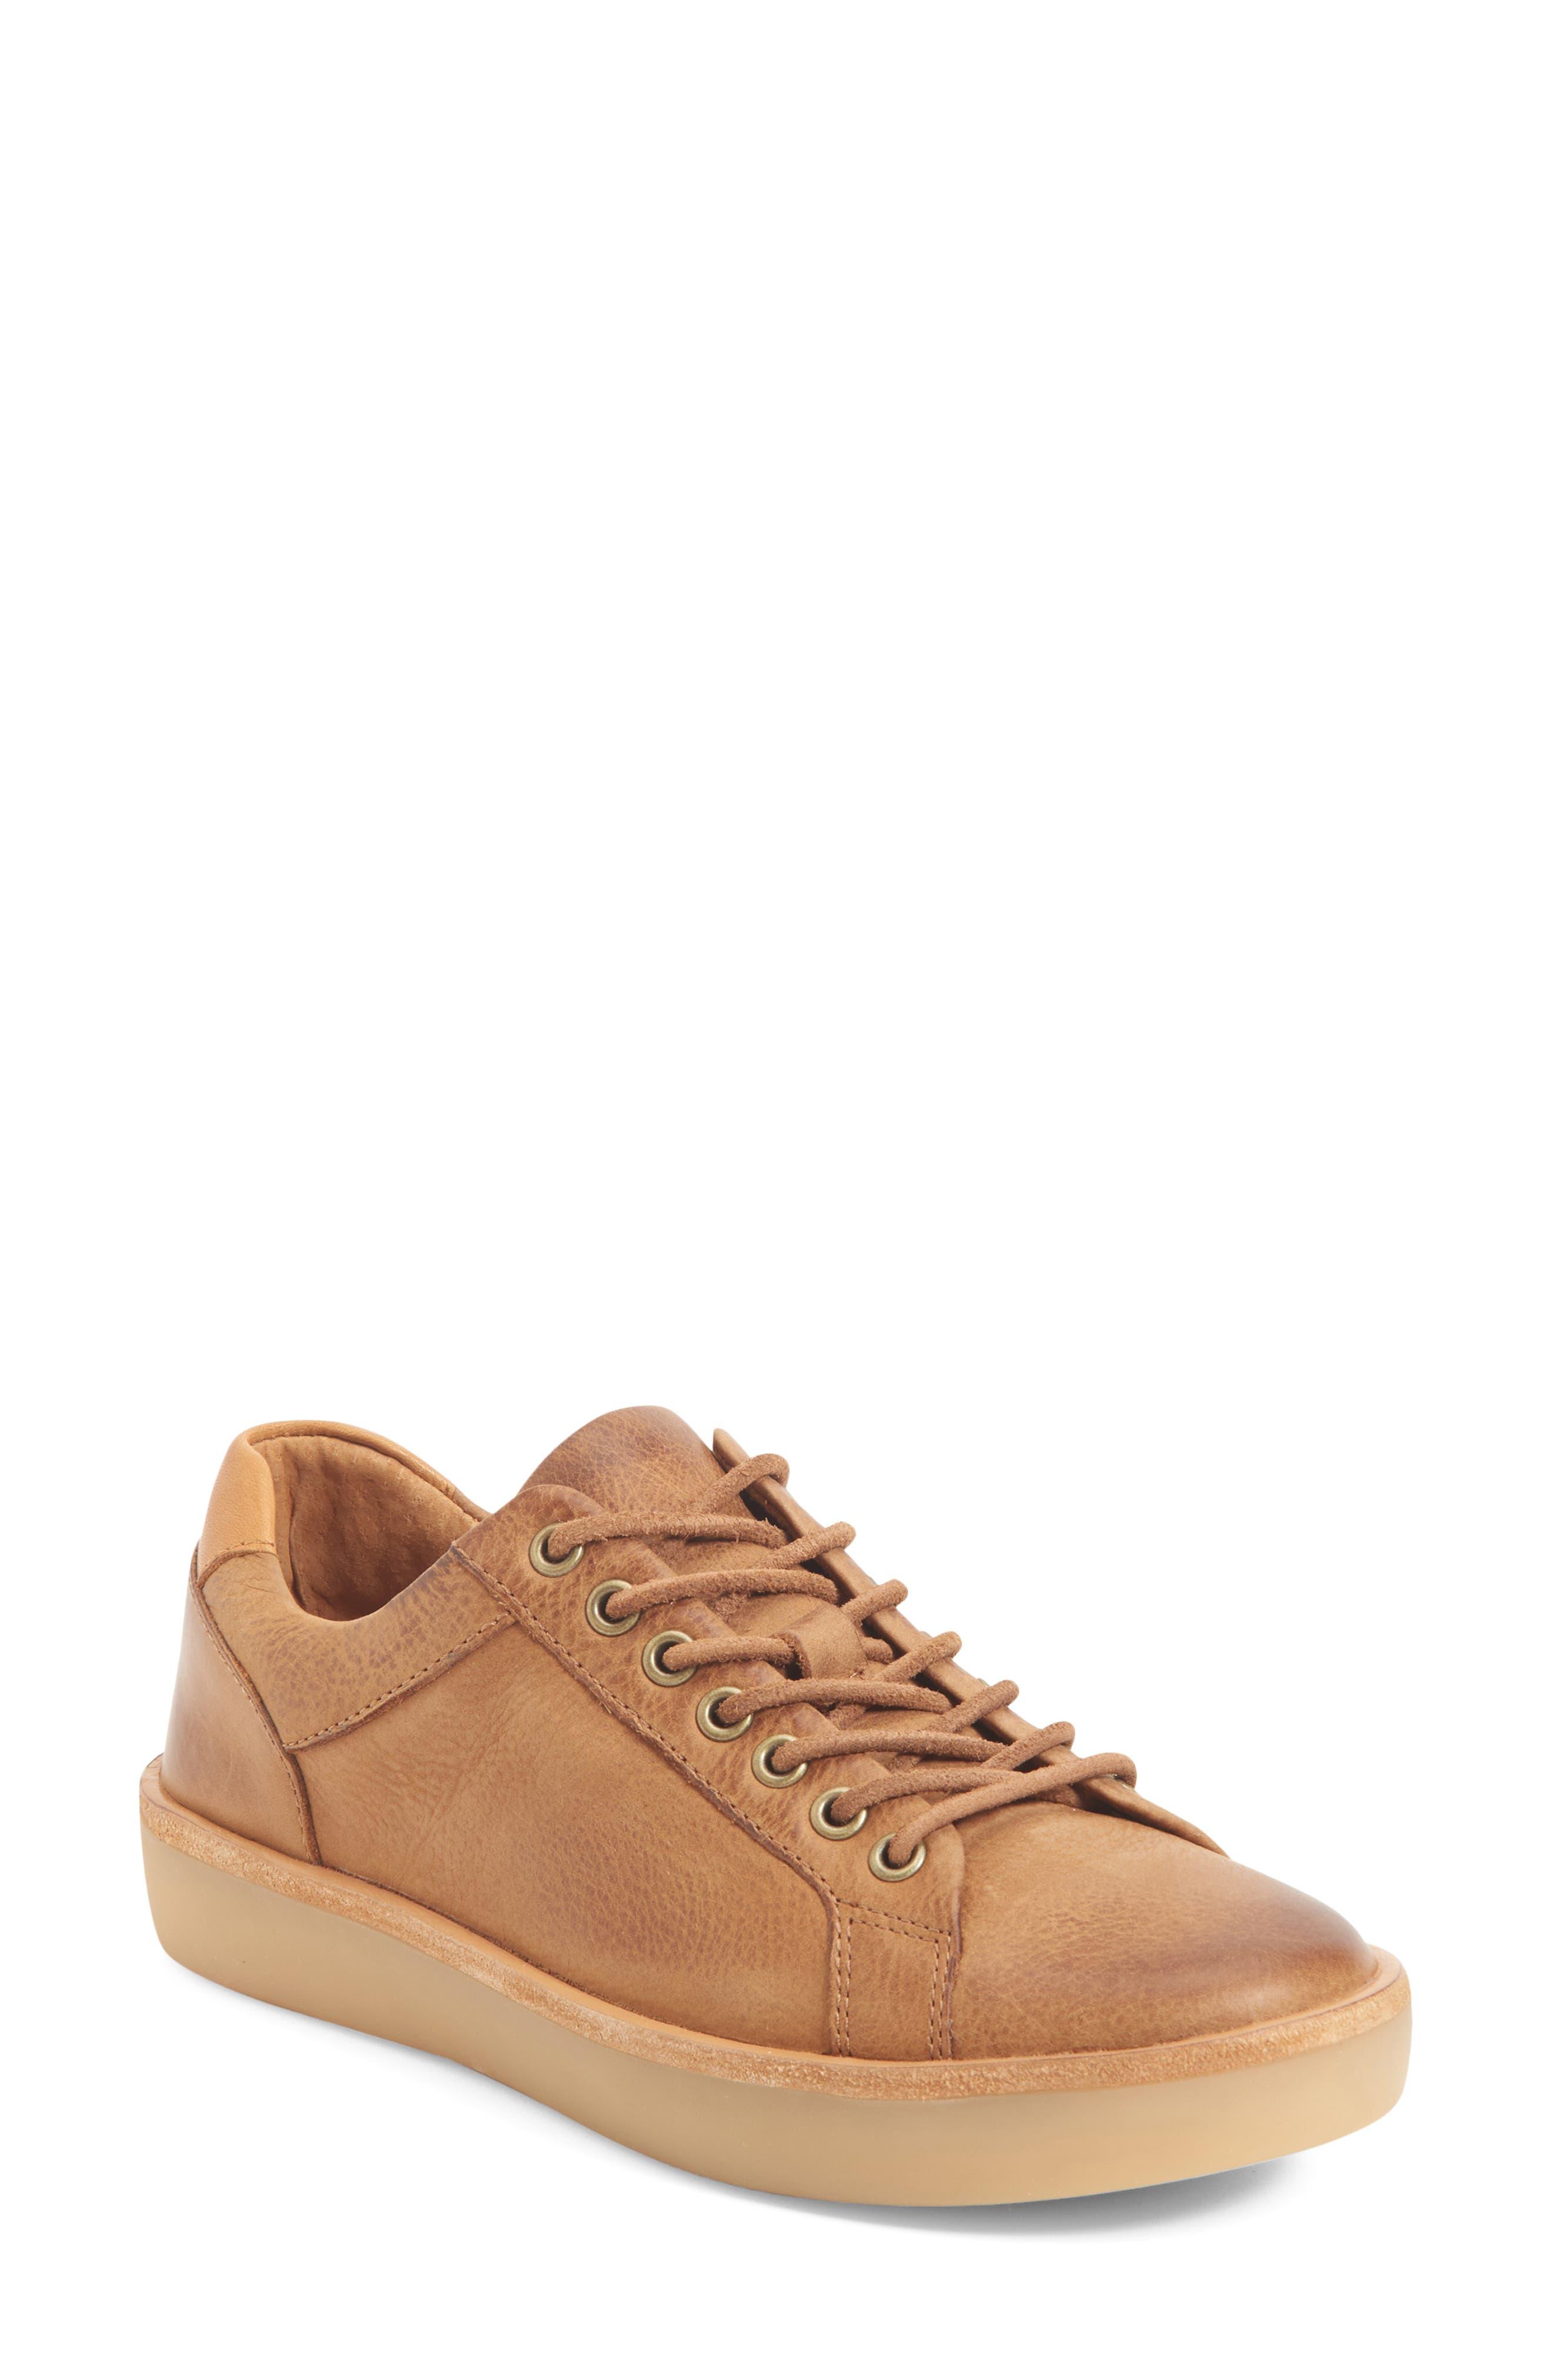 Women's Kork-Ease Maddie Sneaker